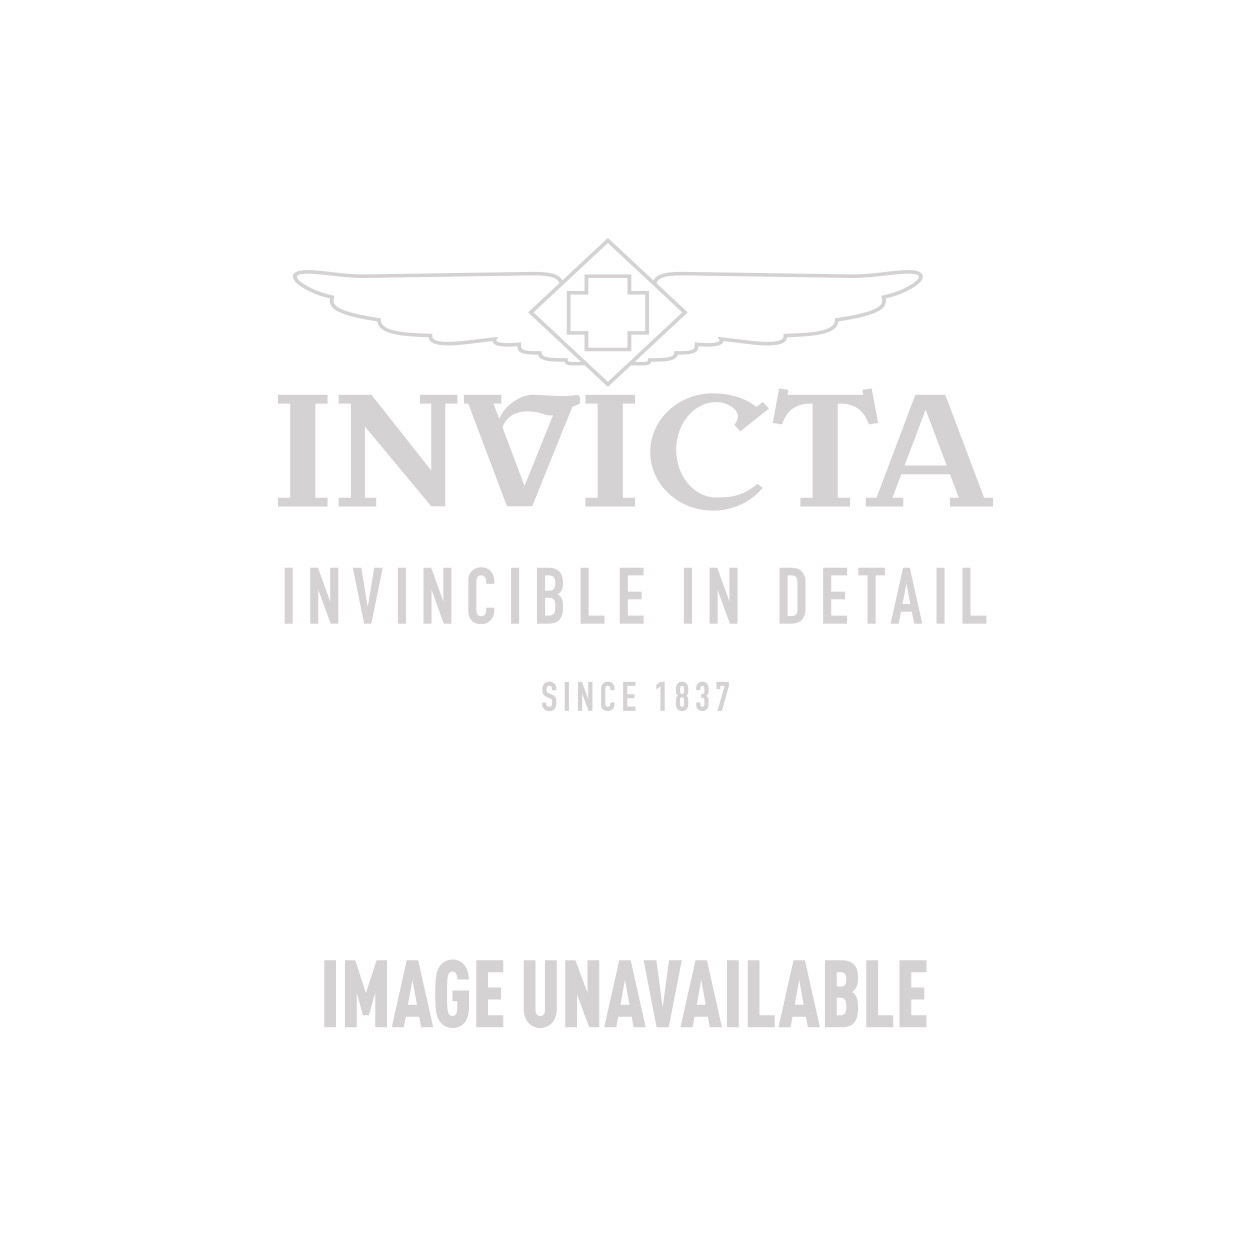 Invicta Corduba Quartz Watch - Black, Gunmetal case with Yellow tone Leather band - Model 90218